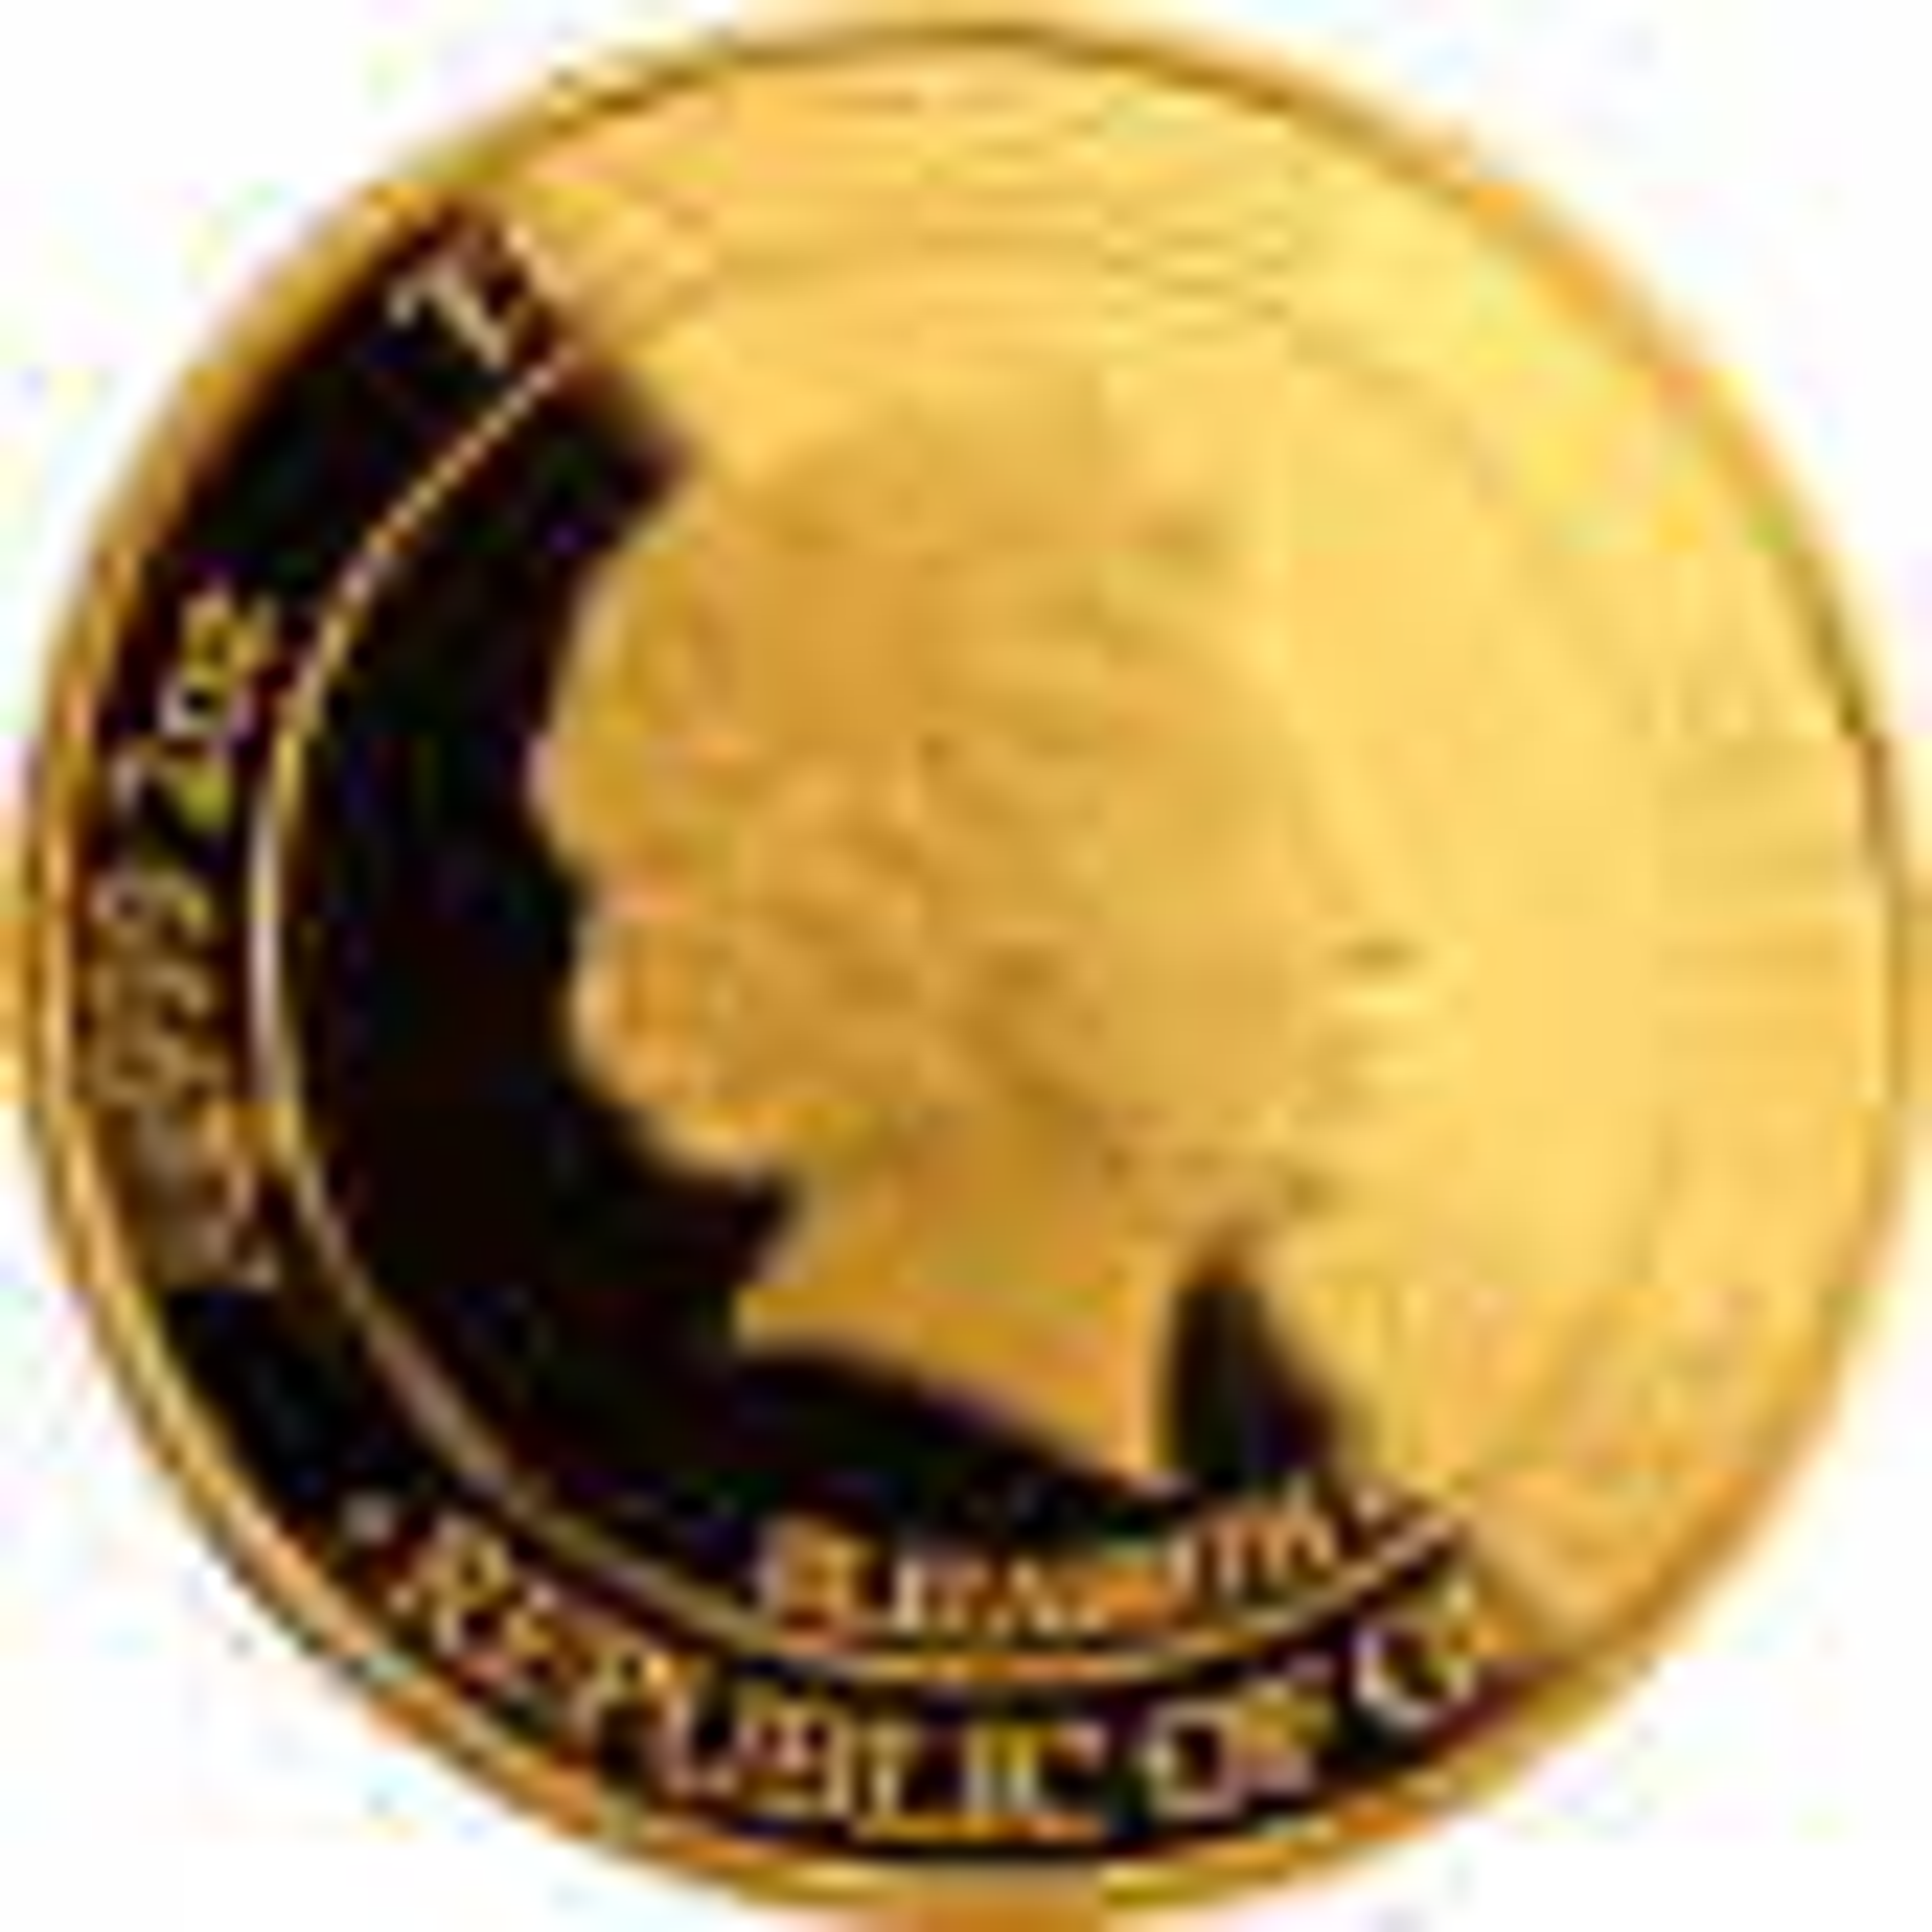 Chinese Drakenvaas 2 troy ounce zilveren munt 2021